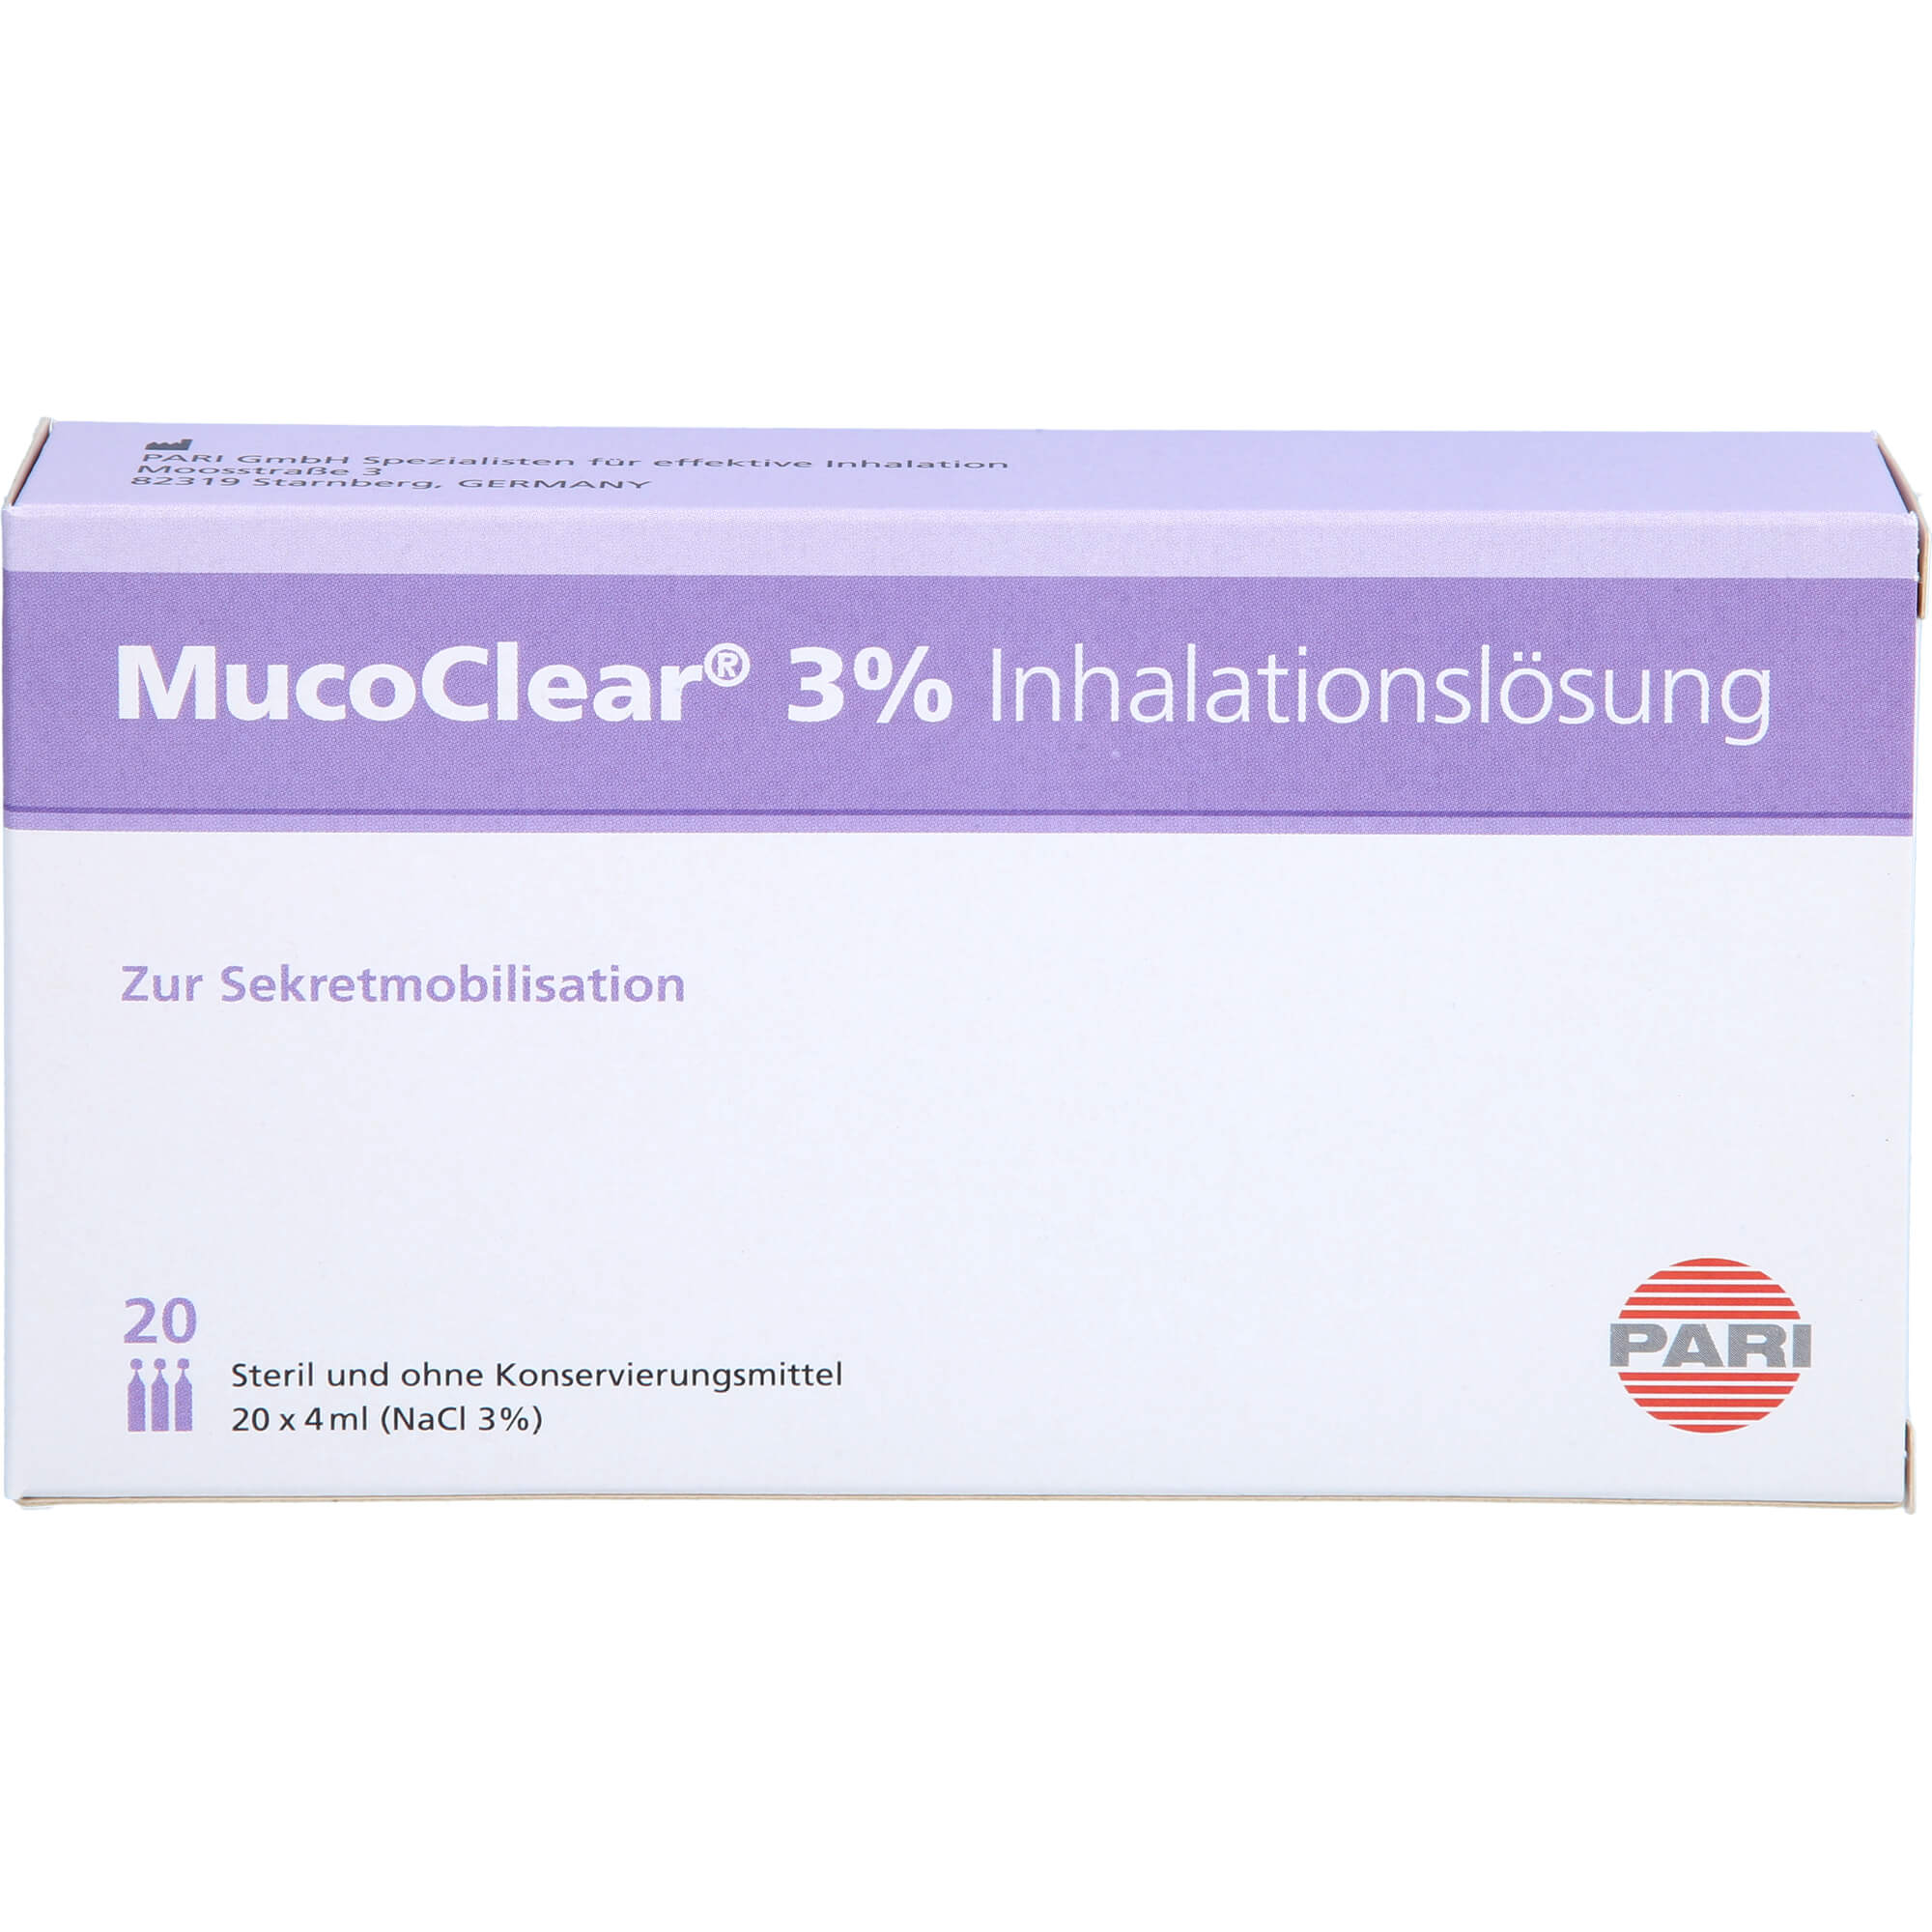 MUCOCLEAR 3% NaCl Inhalationslösung